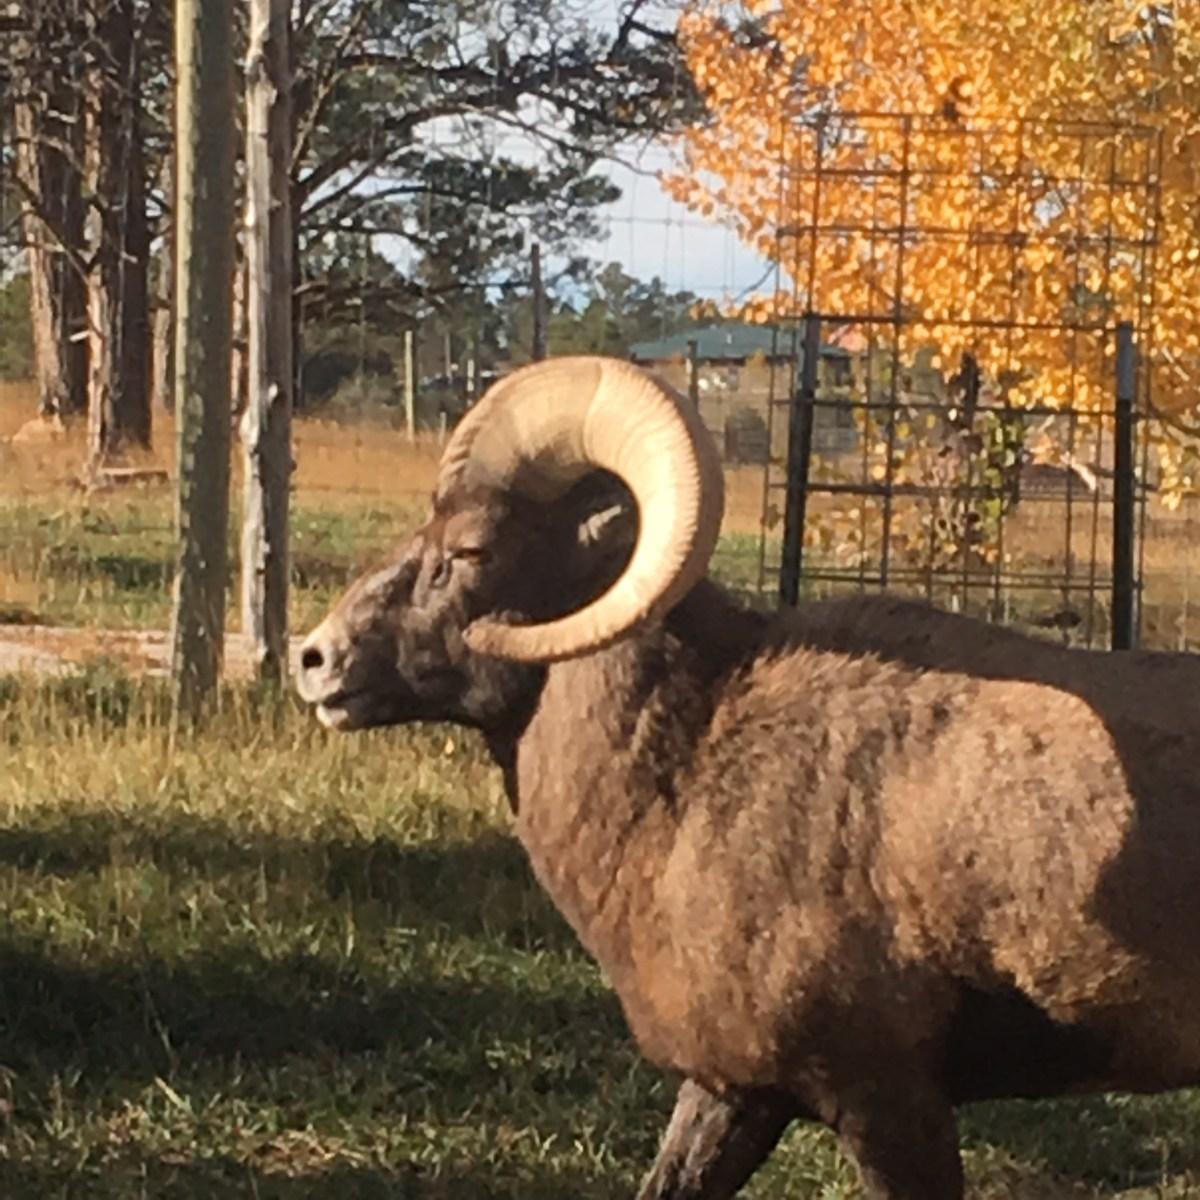 Big Horn Sheep at Bear Country USA South Dakota